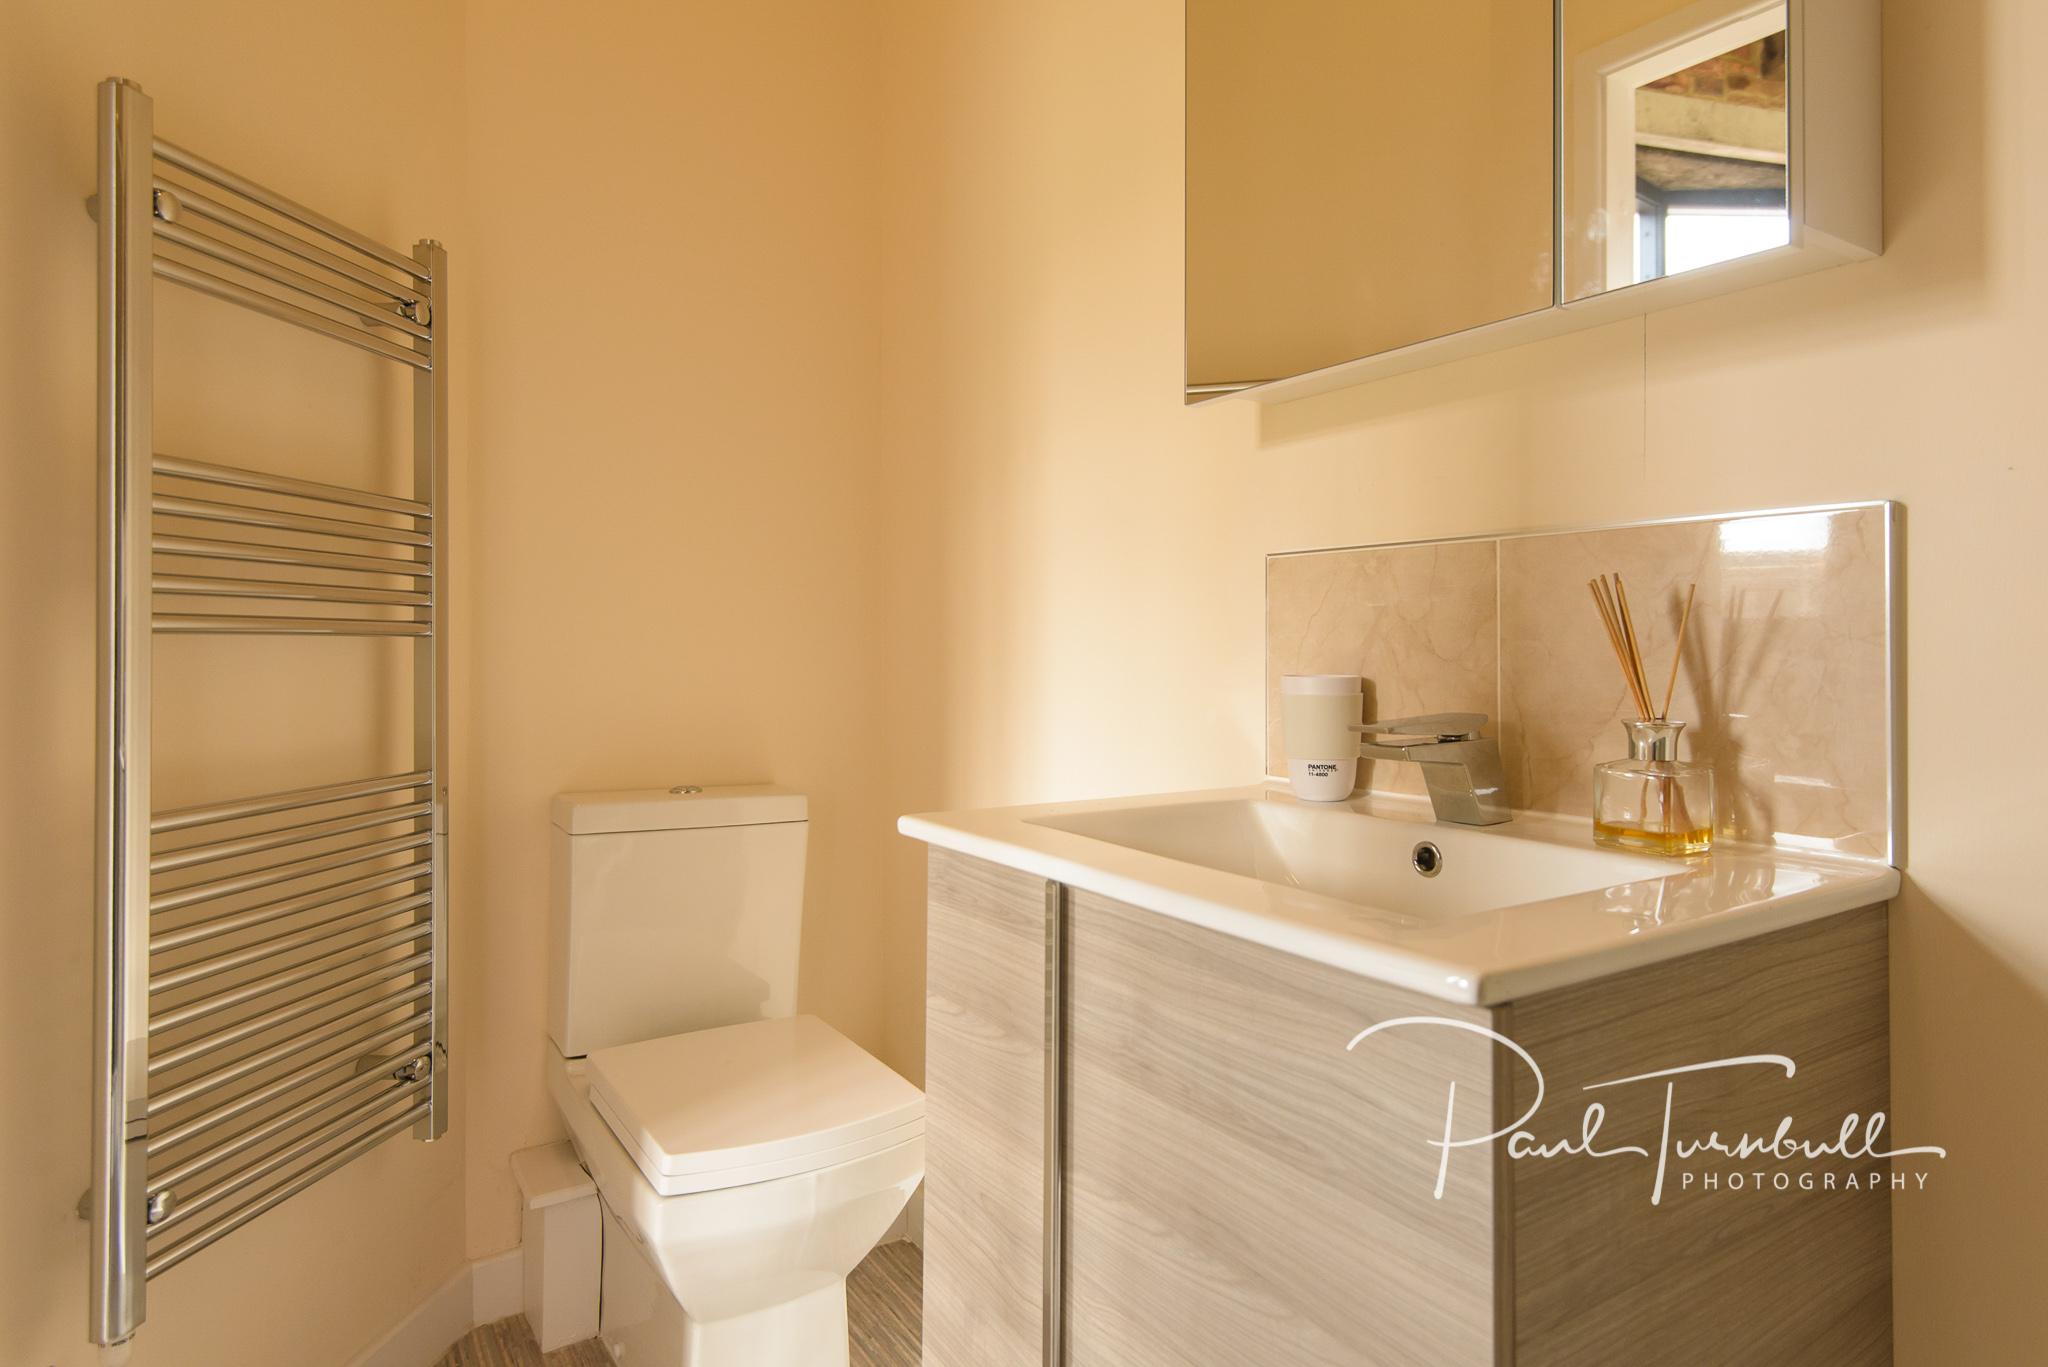 commercial-property-photographer-leeds-yorkshire-blackbrook-developments-022.jpg